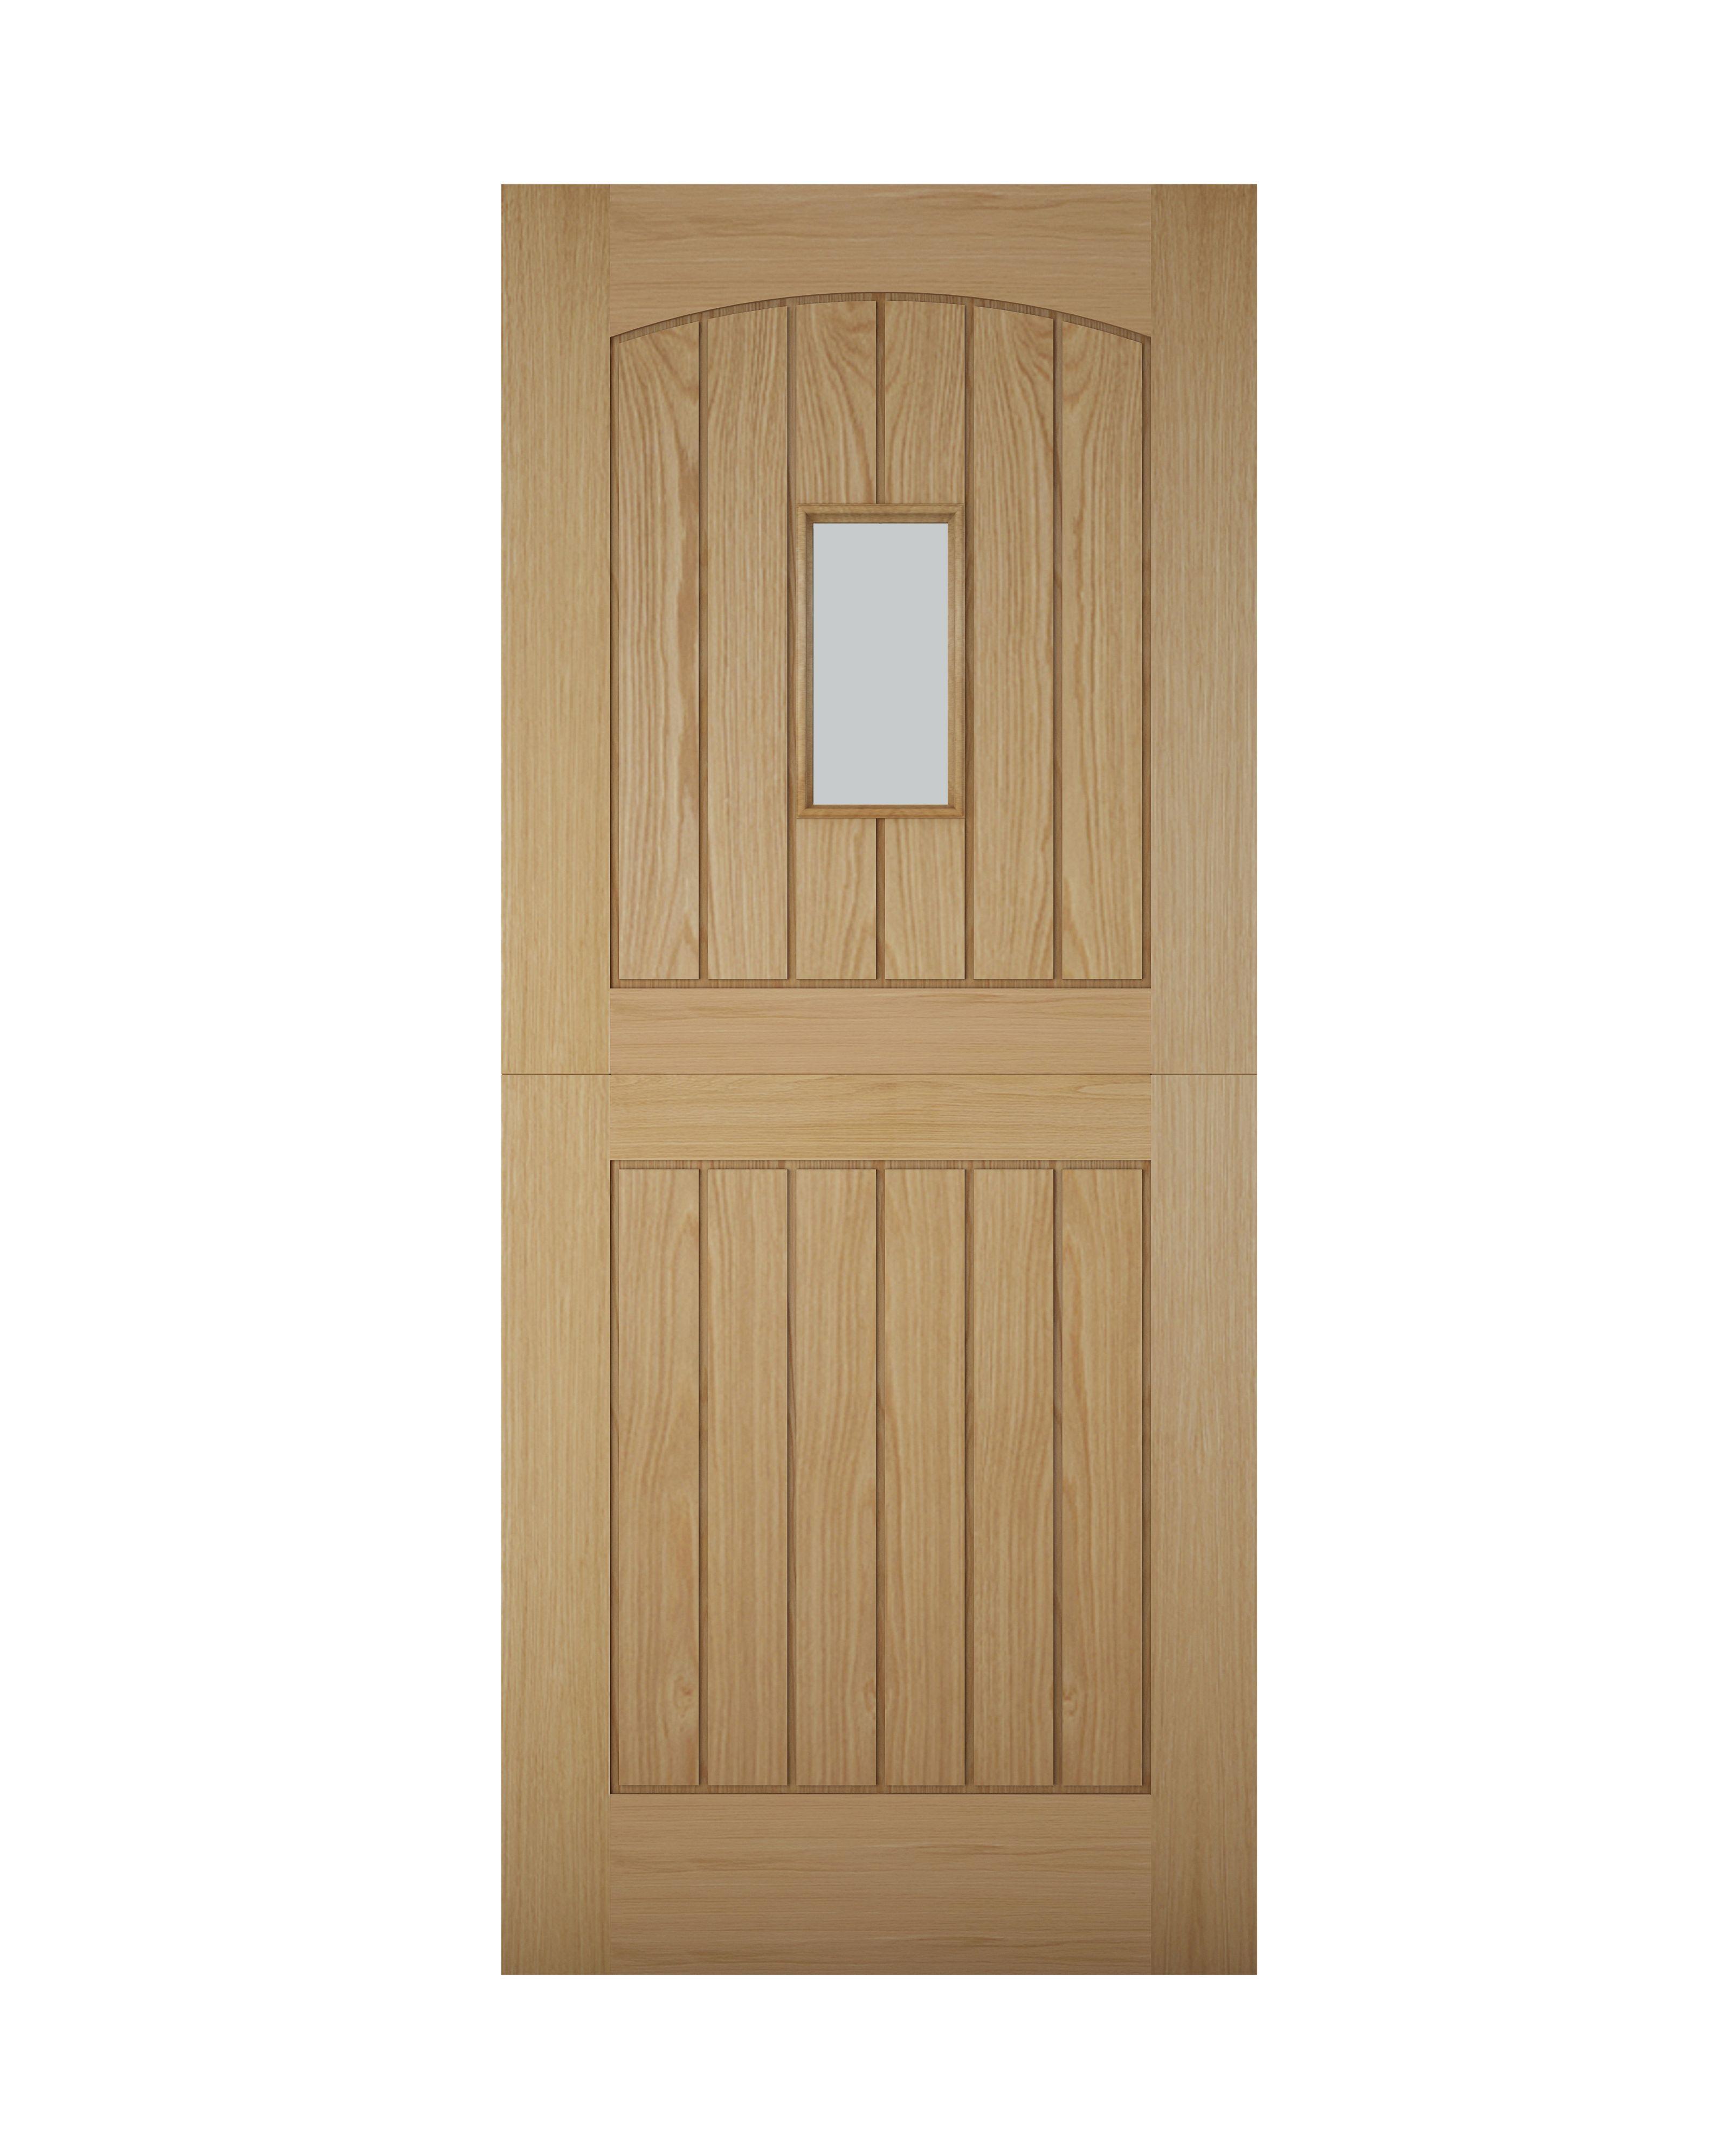 Cottage Stable Panelled White Oak Veneer Glazed Front Door, (h)1981mm (w)838mm